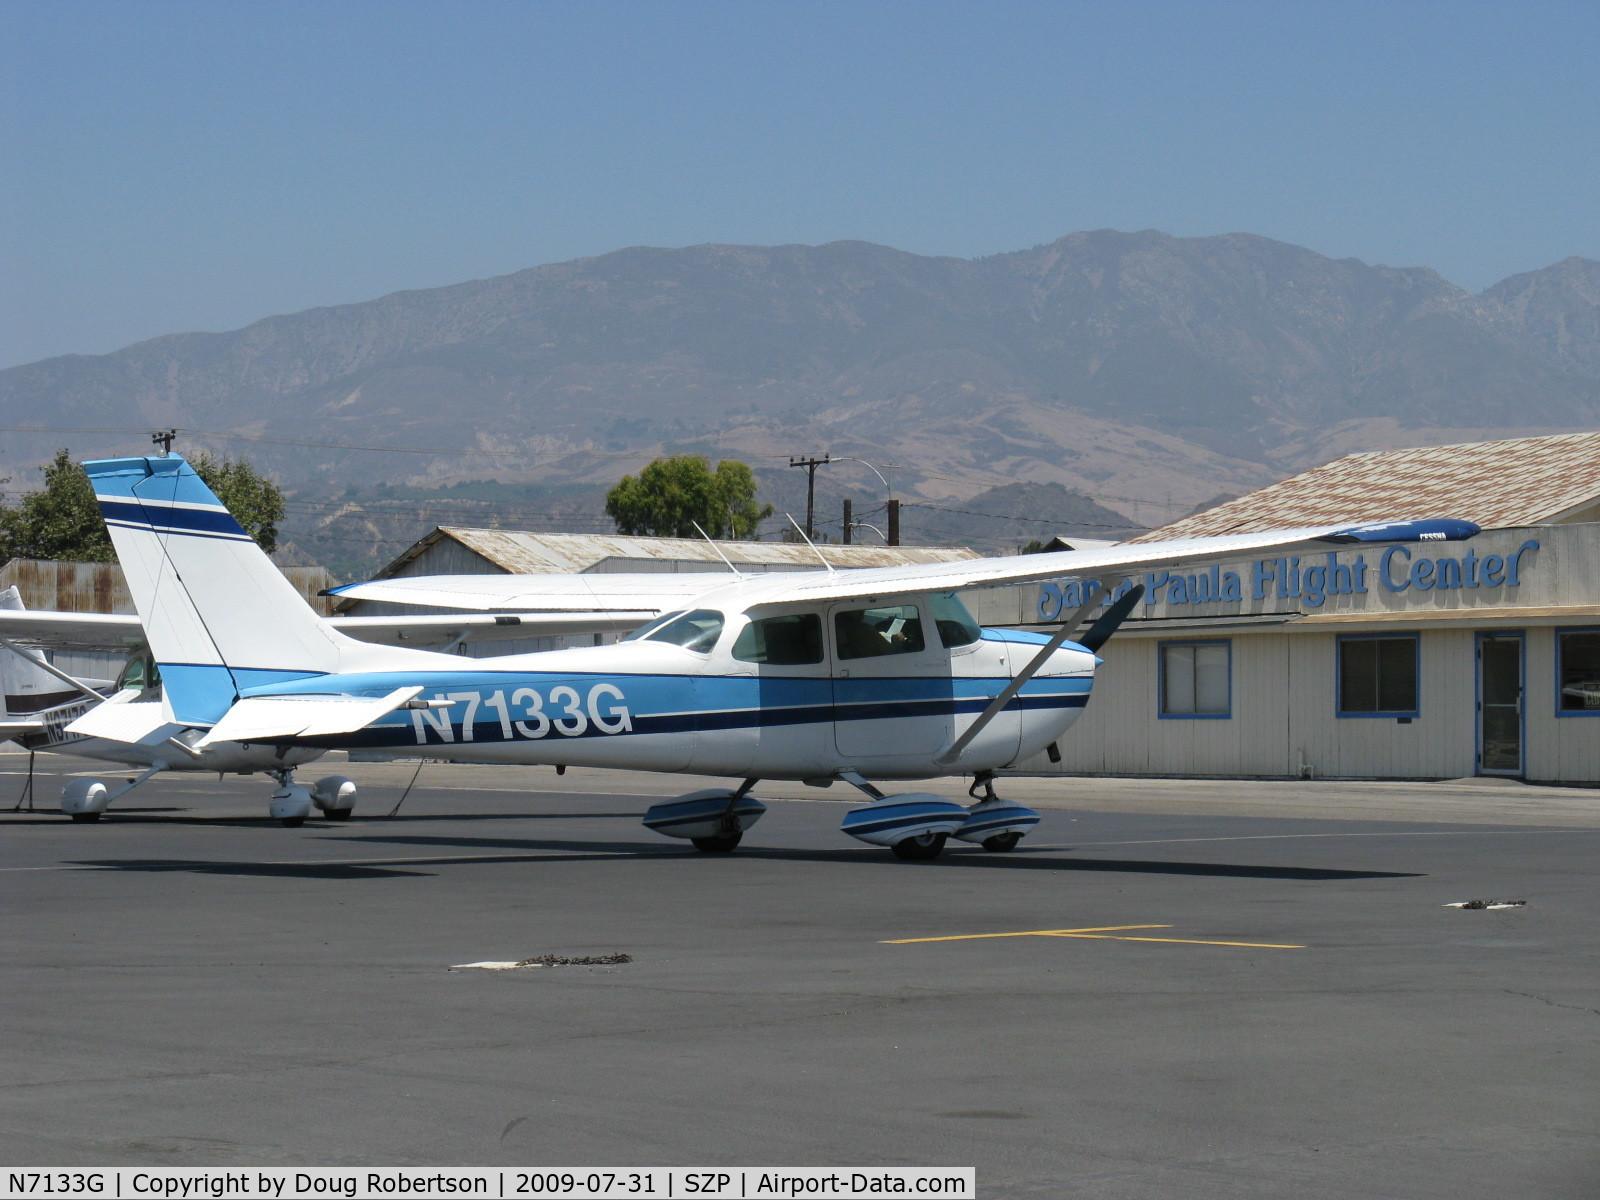 N7133G, 1969 Cessna 172K Skyhawk C/N 17258833, 1969 Cessna 172K, Lycoming O-320-E2D 150 Hp, pre-start